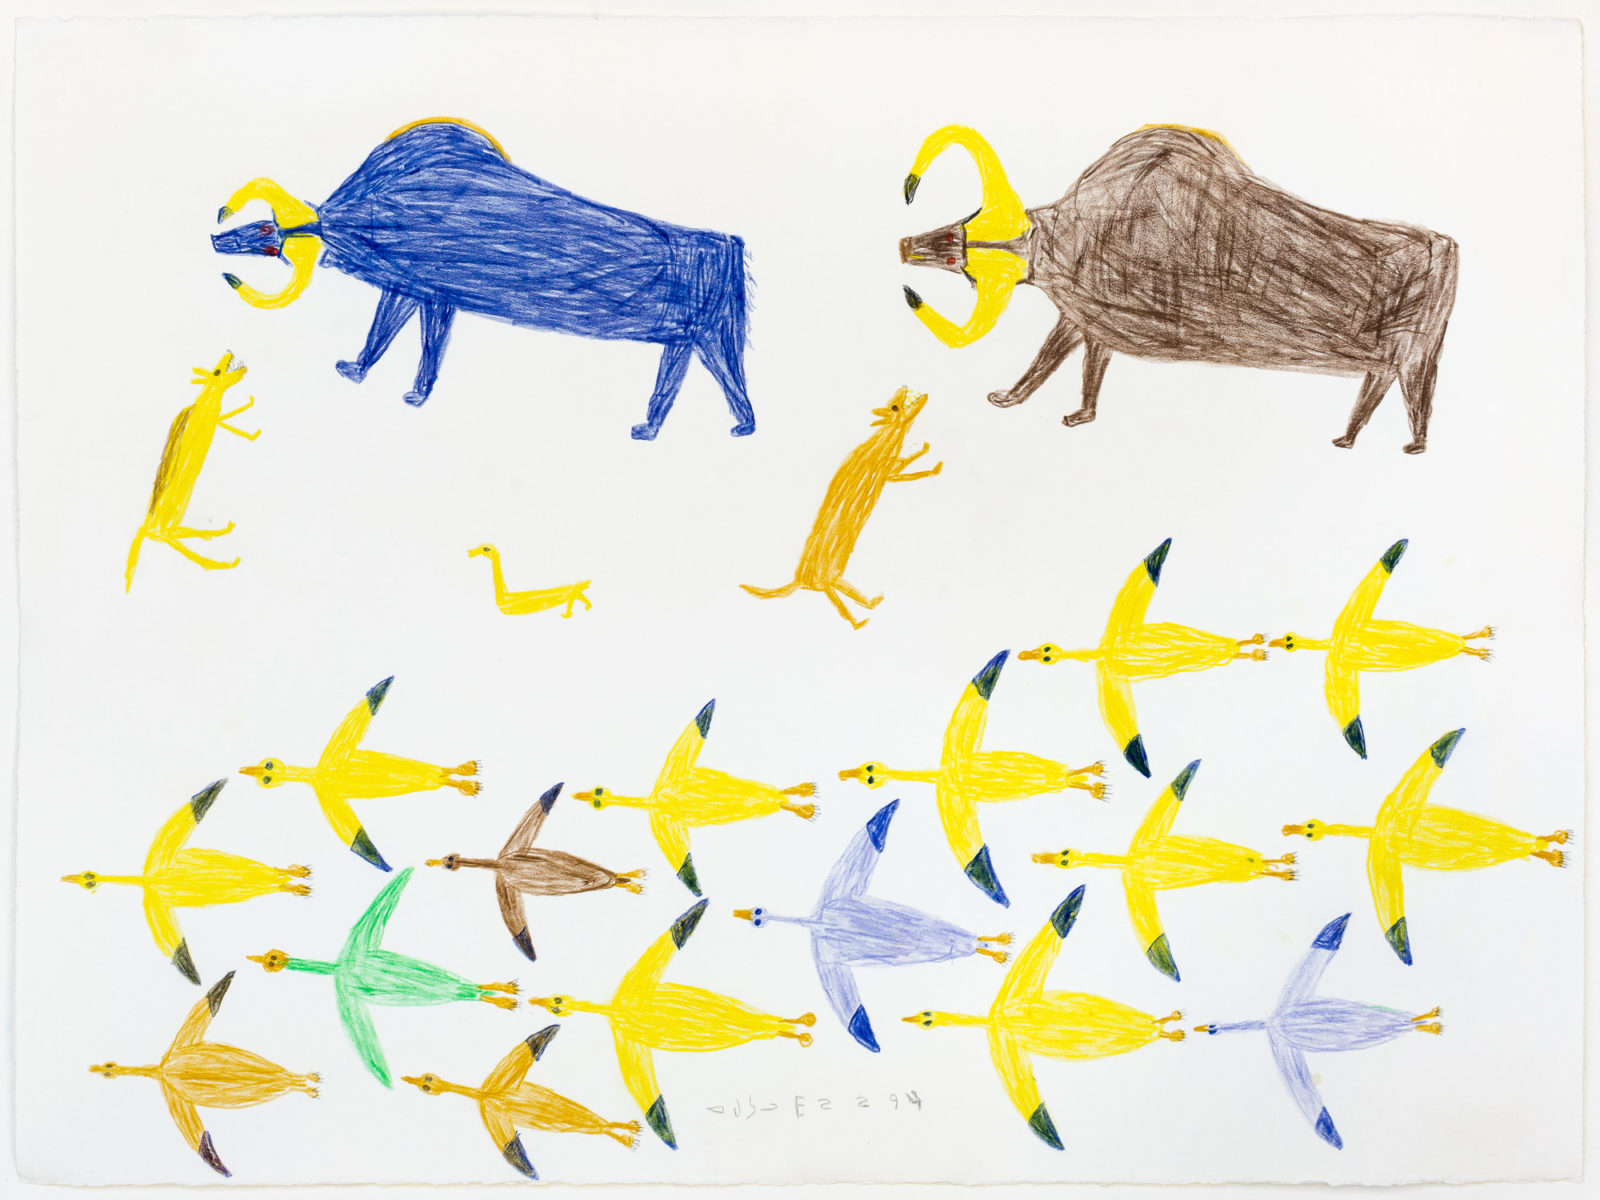 Luke Anguhadluq - untitled (birds and Muskoxen)